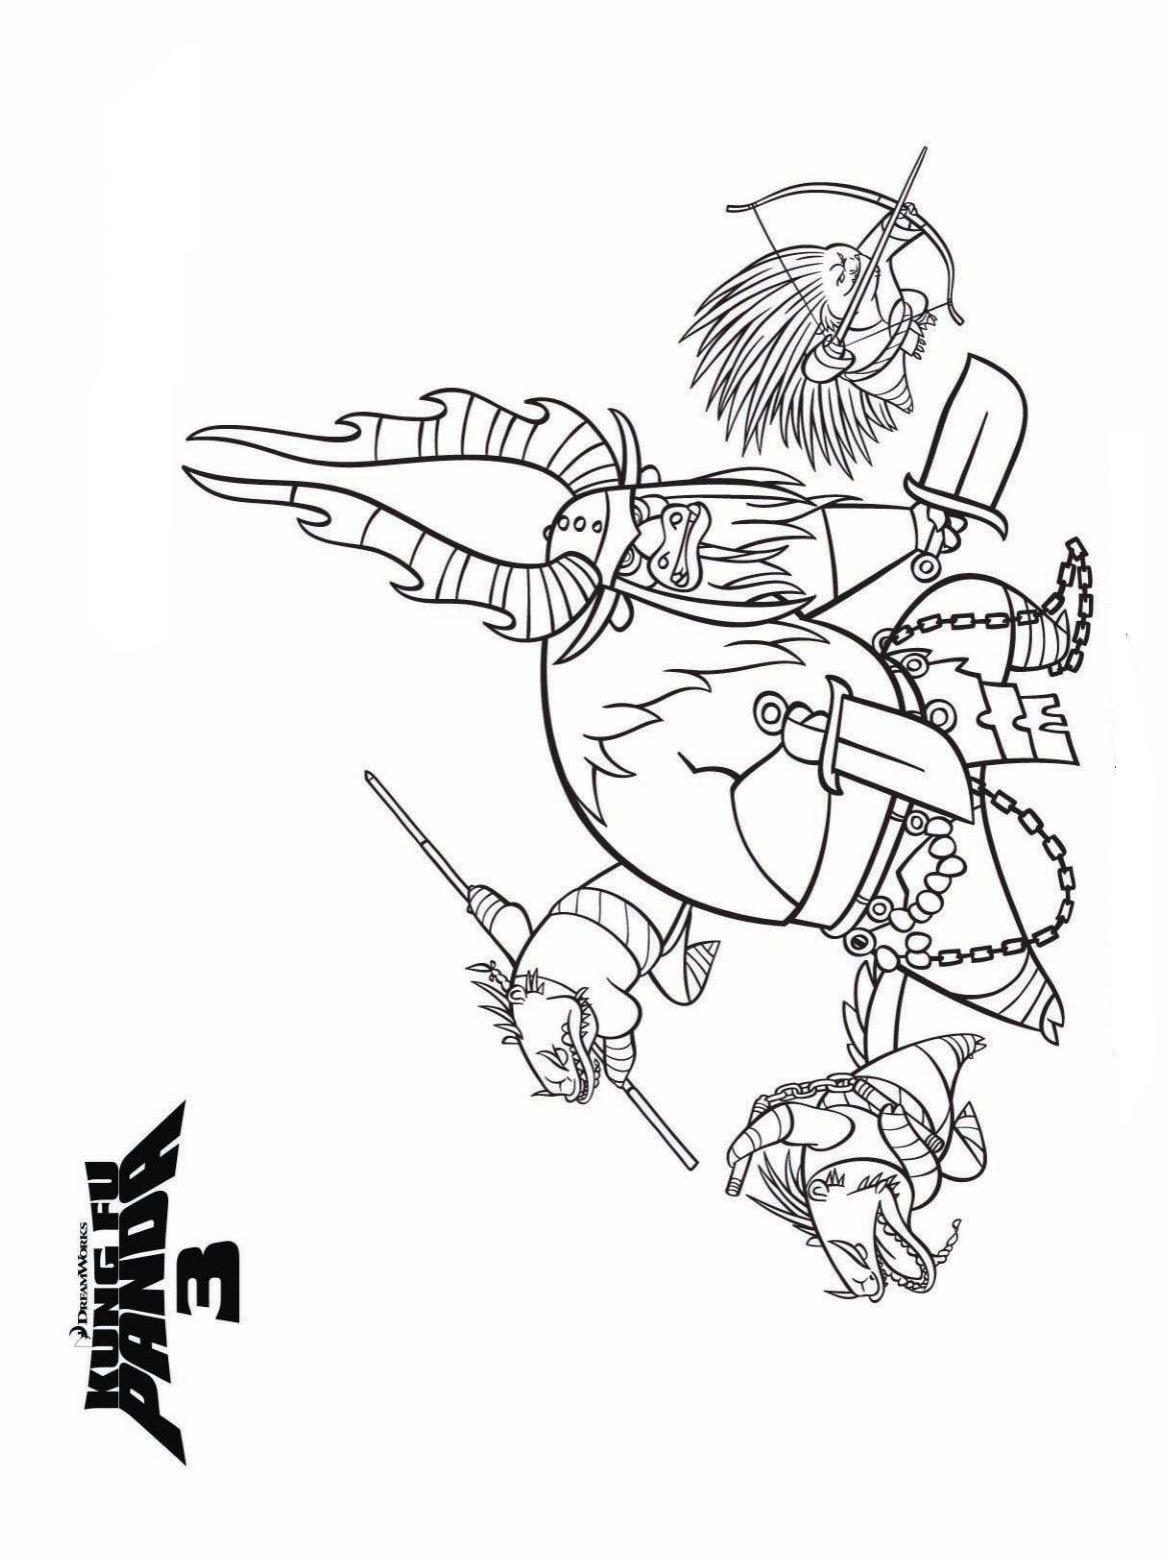 kidsnfun  coloring page kung fu panda 3 kung fu panda 3